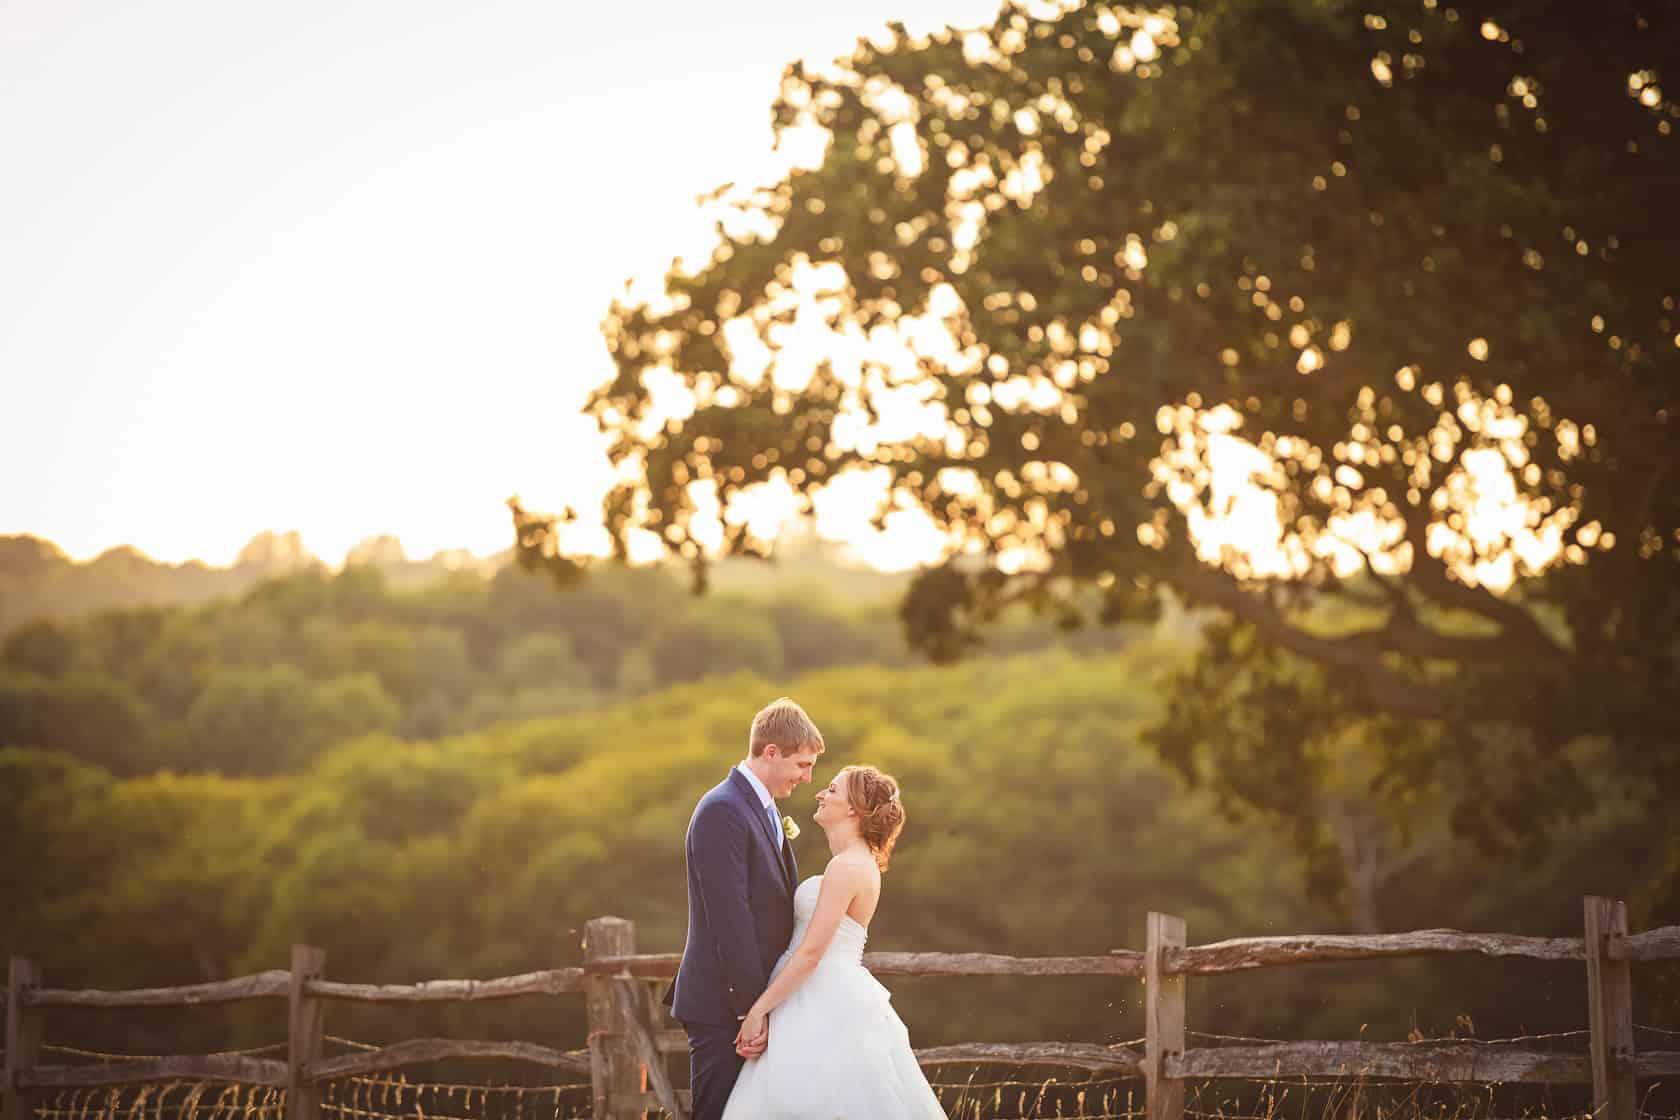 Best_Wedding_Photography_2018_Wedding-Photographer-Essex-and-London_056